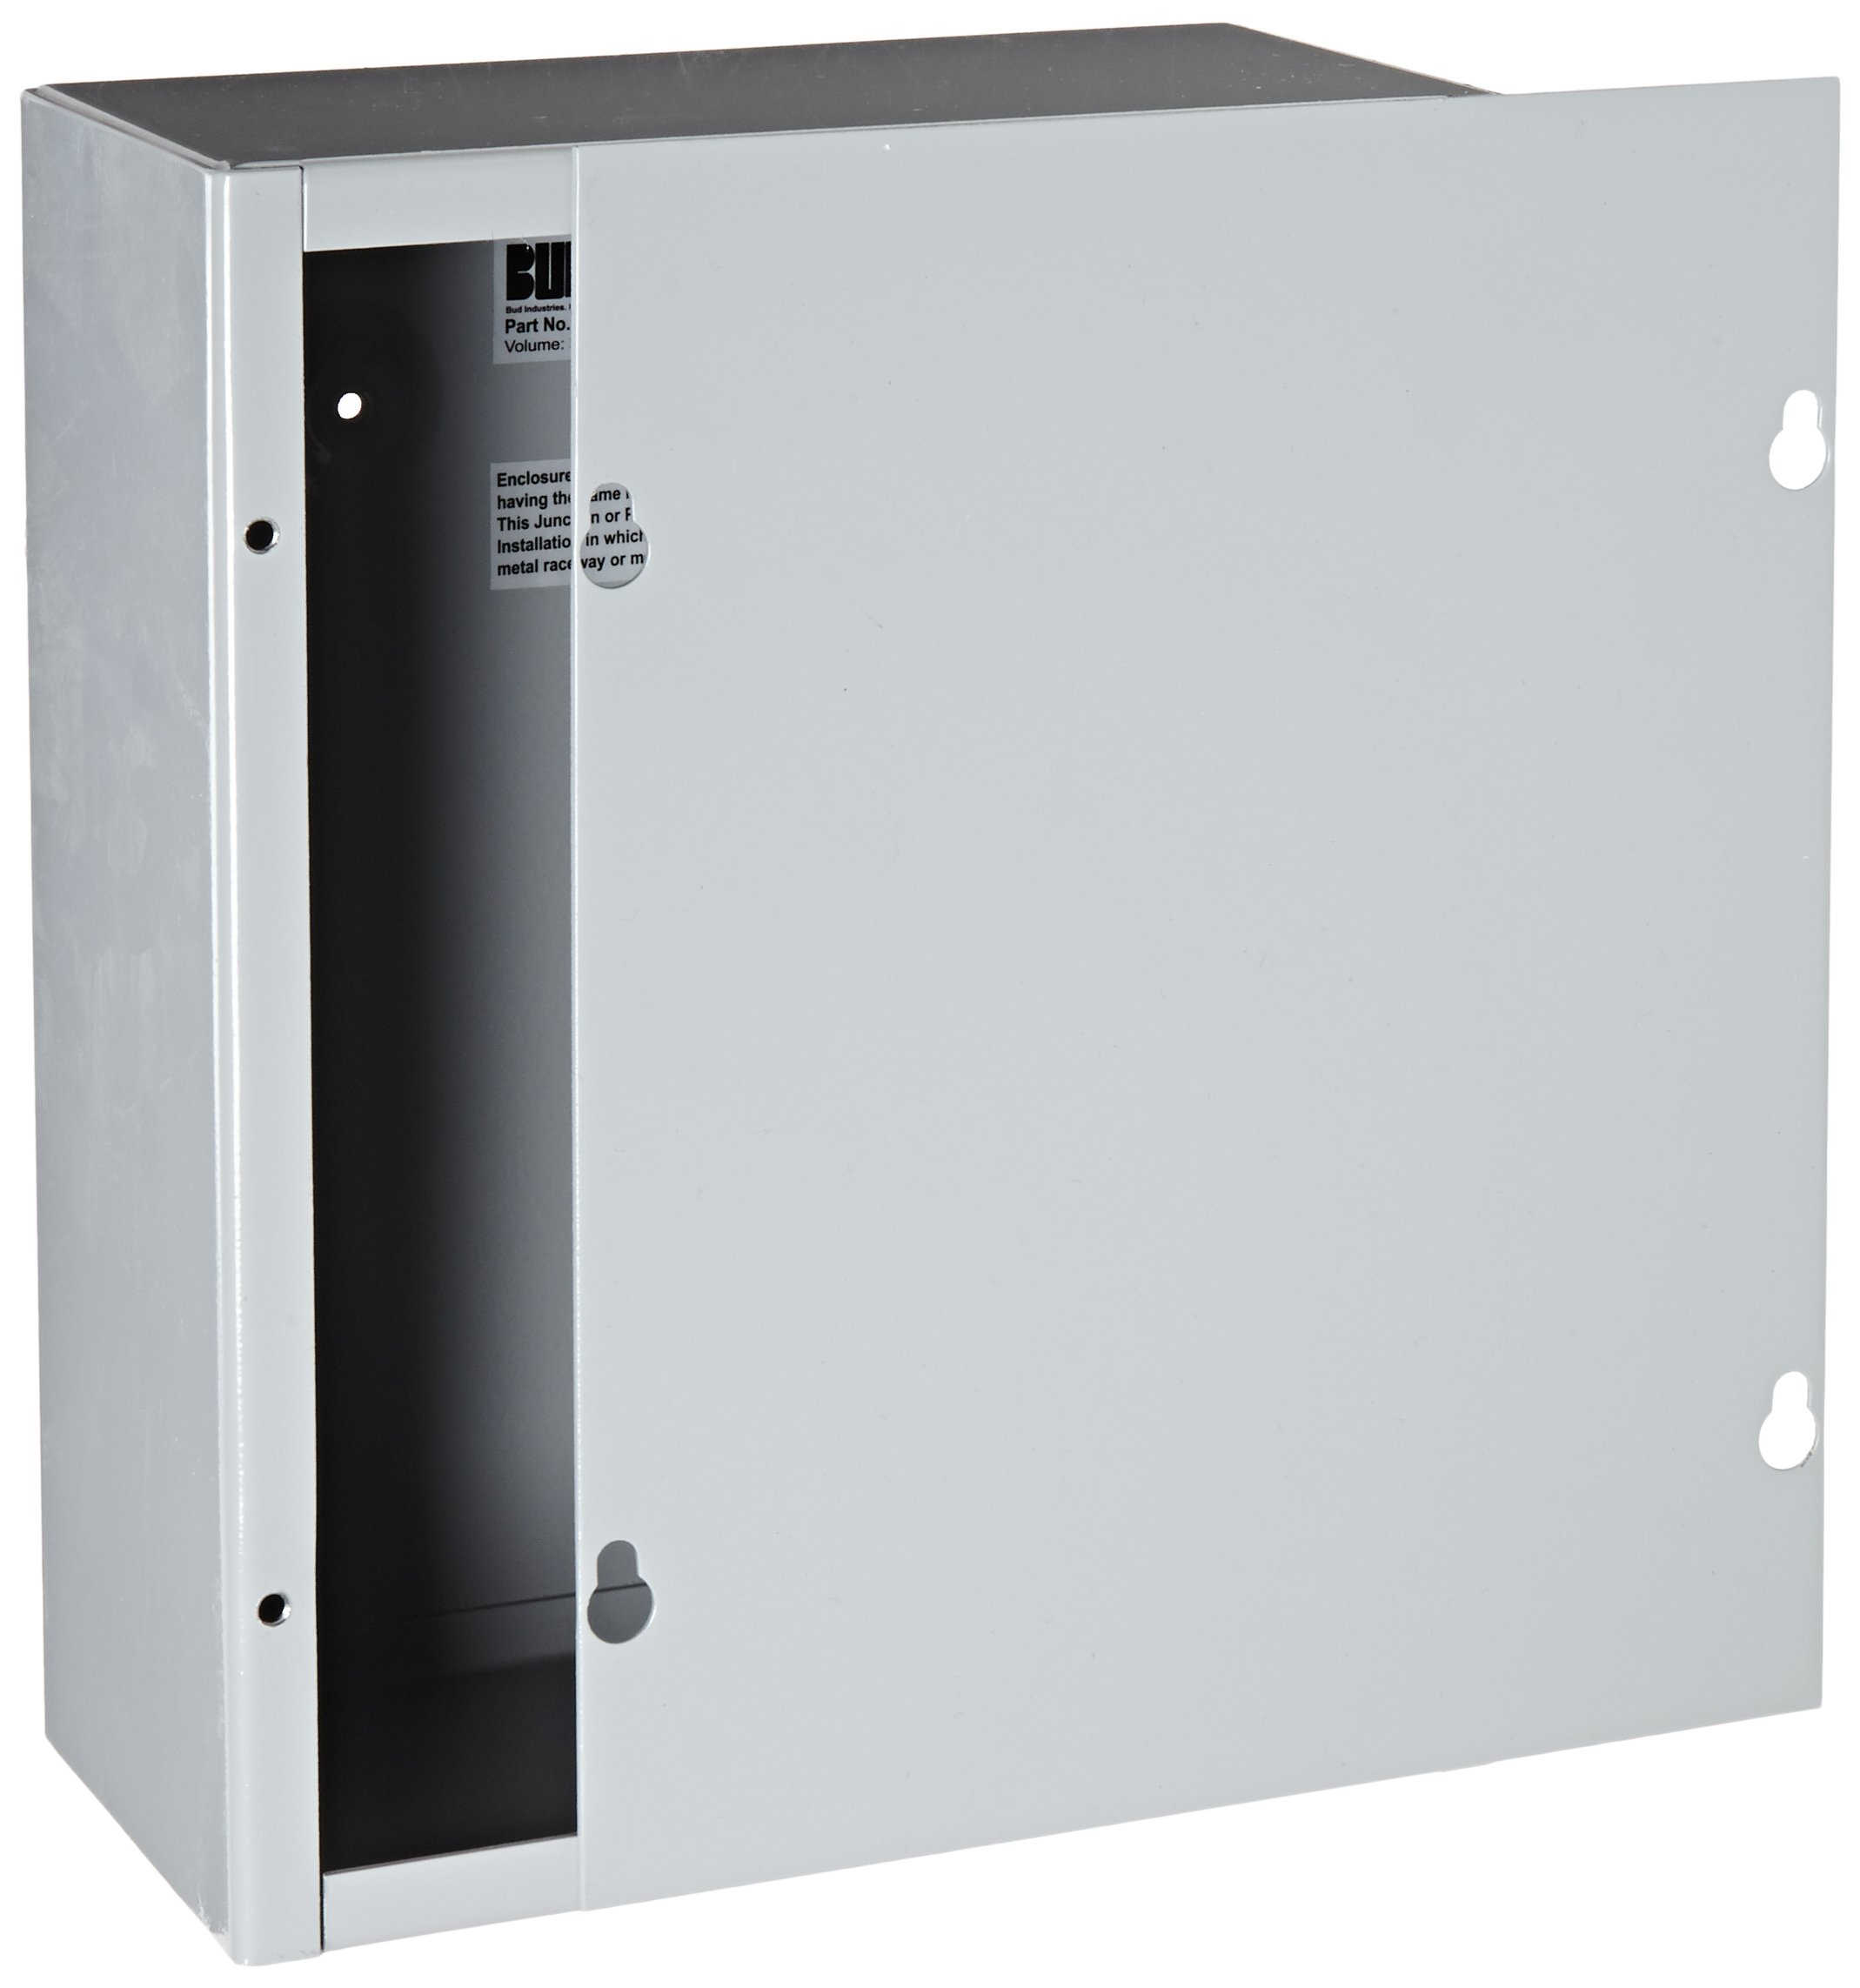 BUD Industries JB-3958 Steel NEMA 1 Sheet Metal Junction Box with Lift-off Screw Cover, 8'' Width x 10'' Height x 4'' Depth, Gray Finish